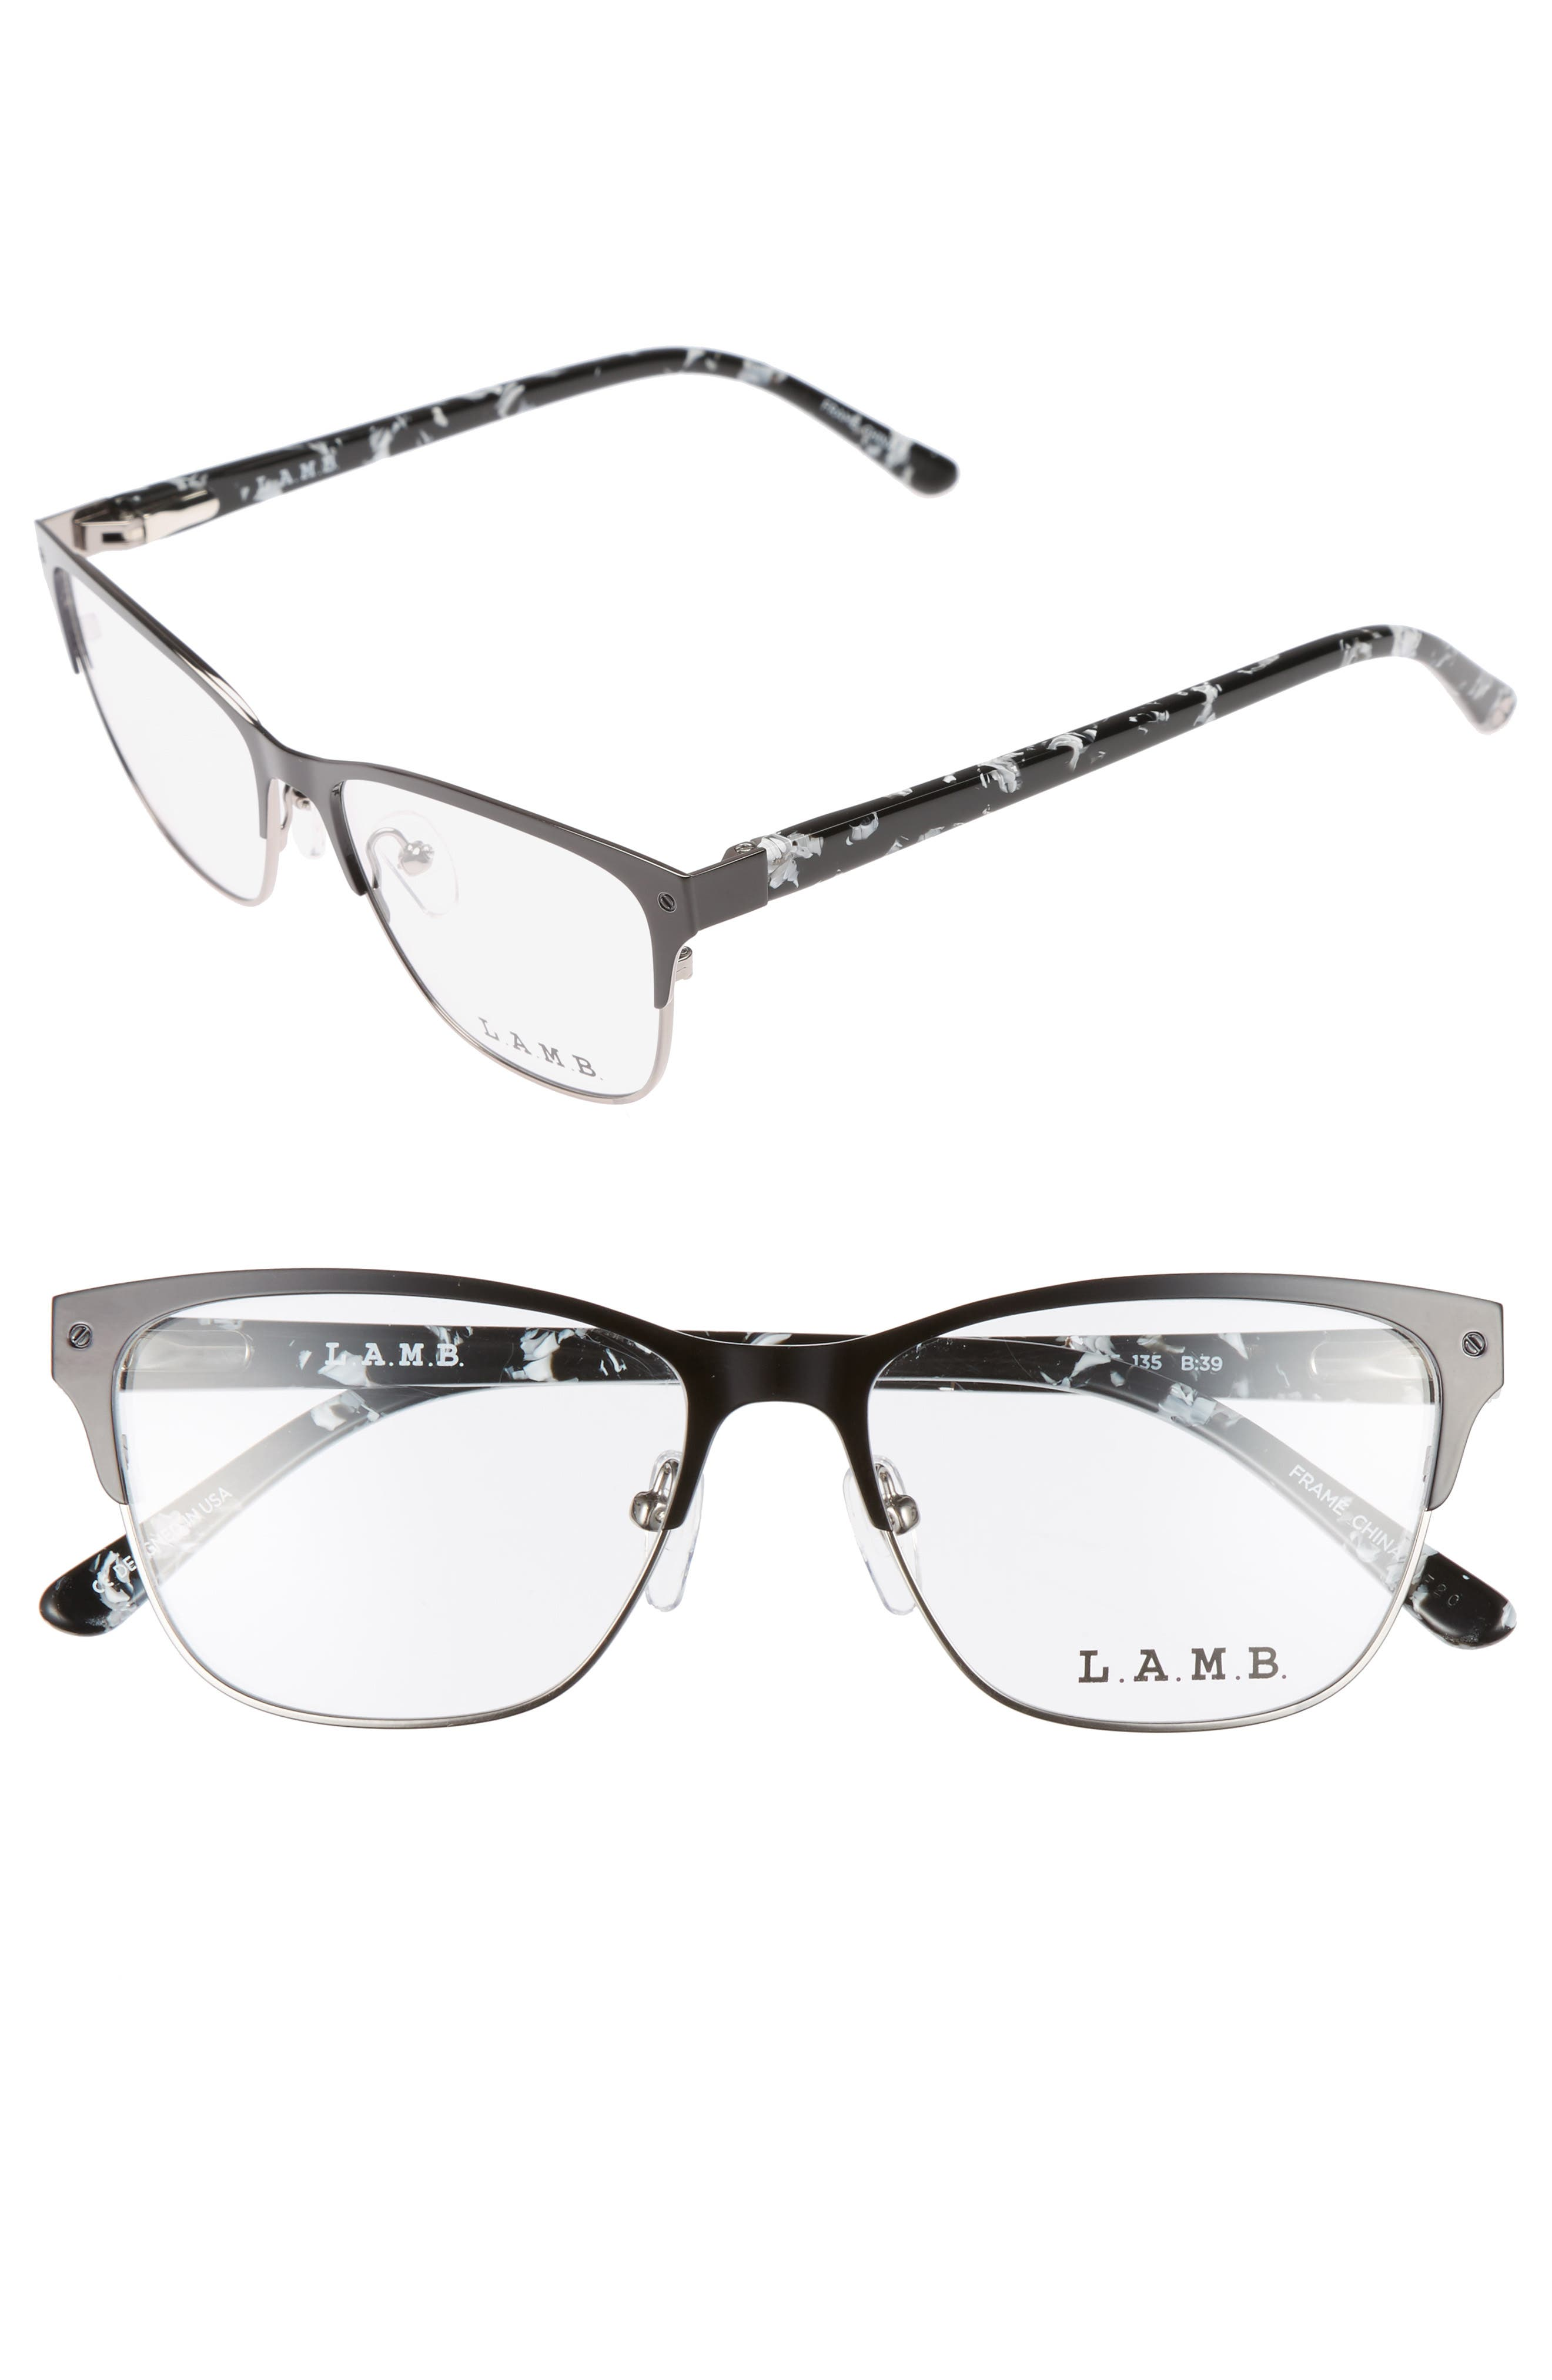 52mm Cat Eye Optical Glasses,                         Main,                         color, Black